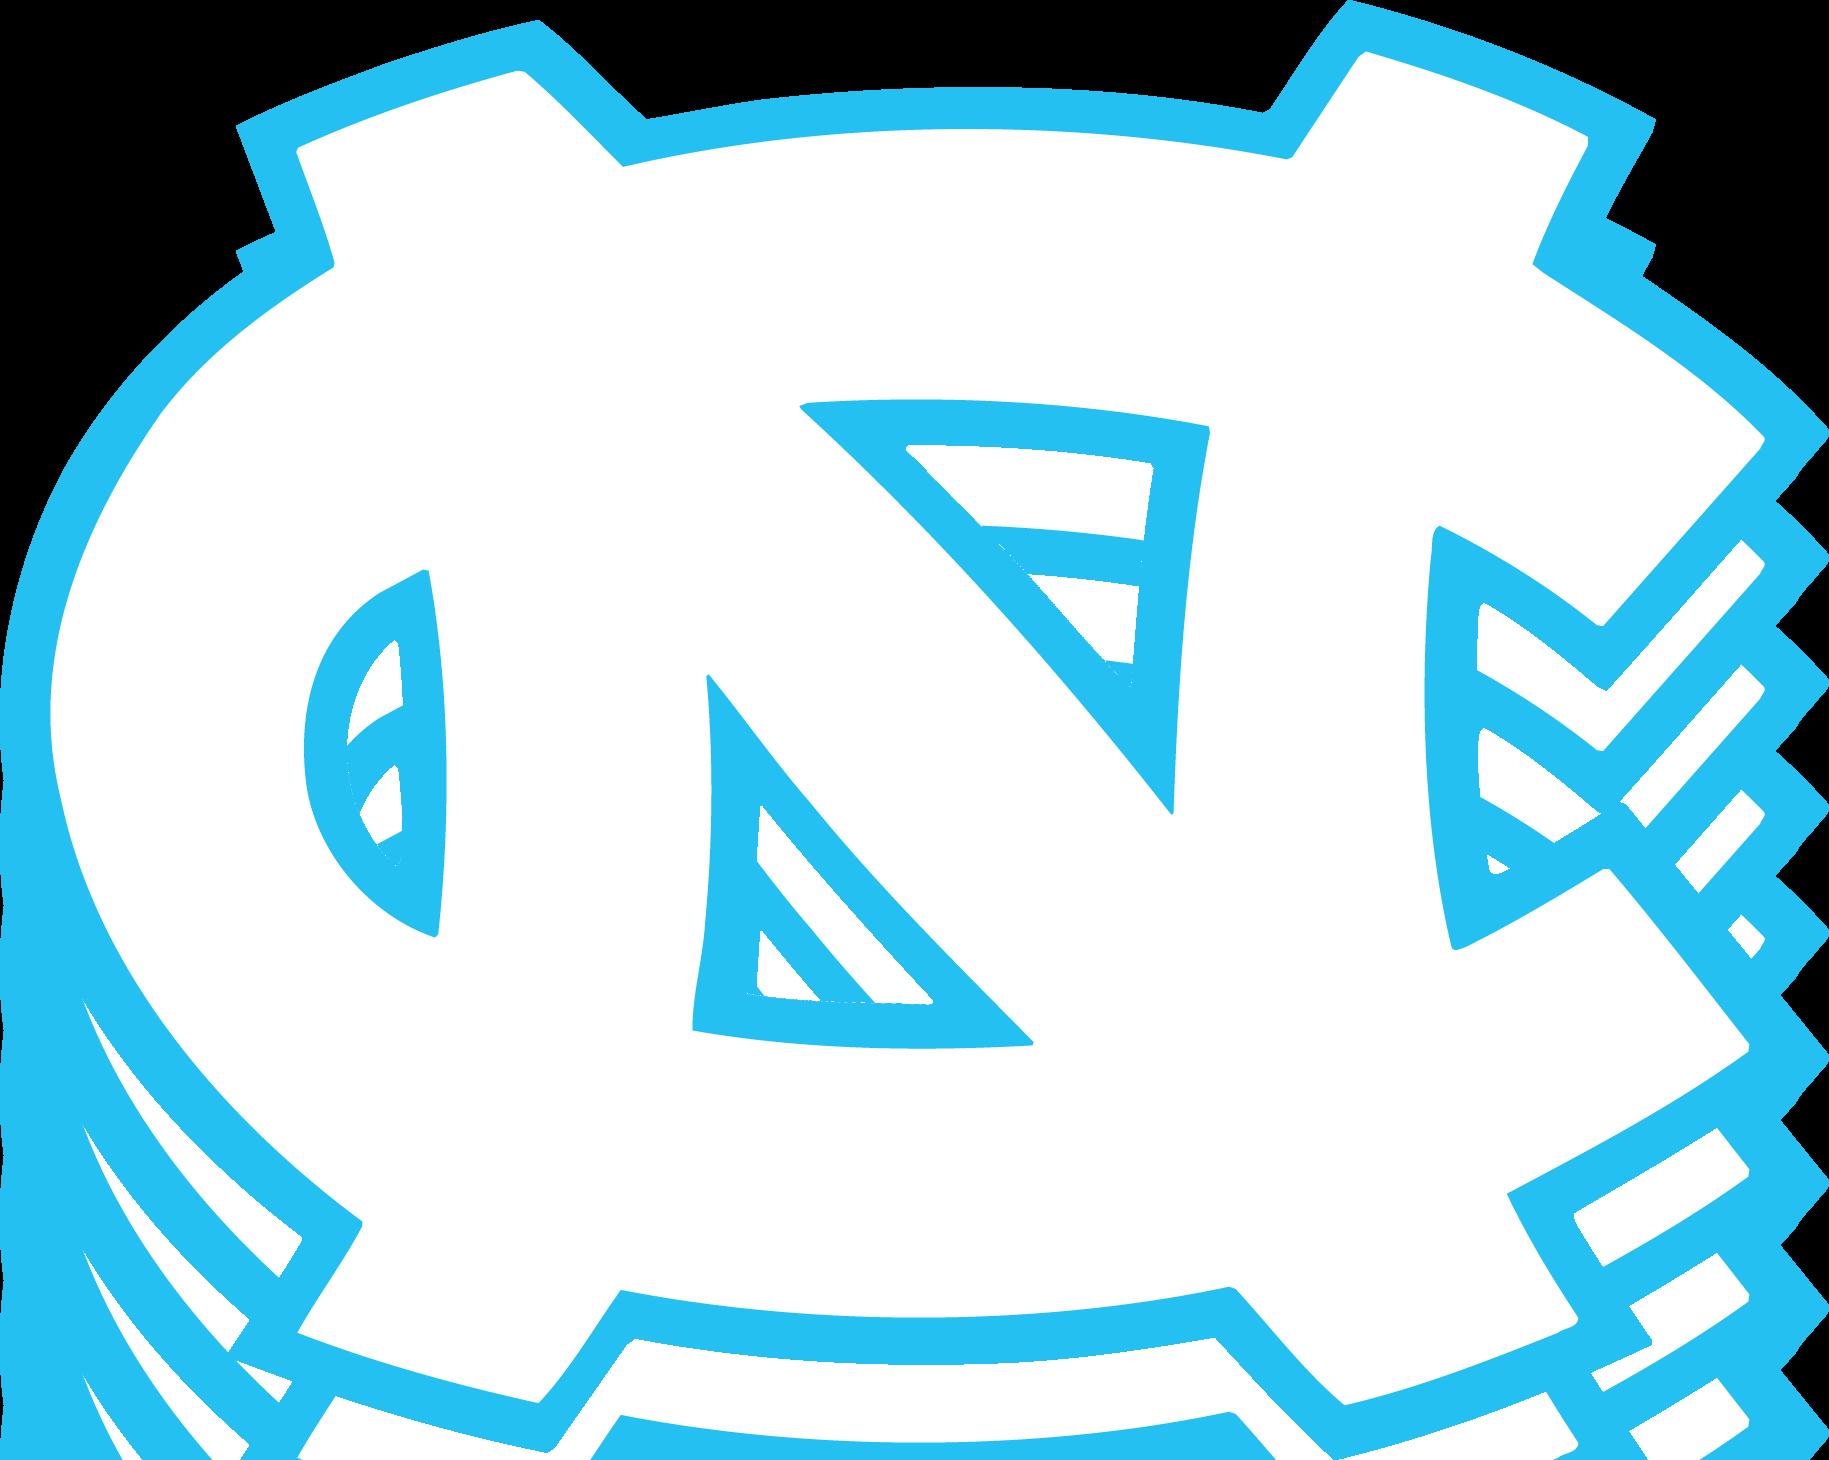 Unc basketball clipart banner free download University of North Carolina | Fox Sports University banner free download